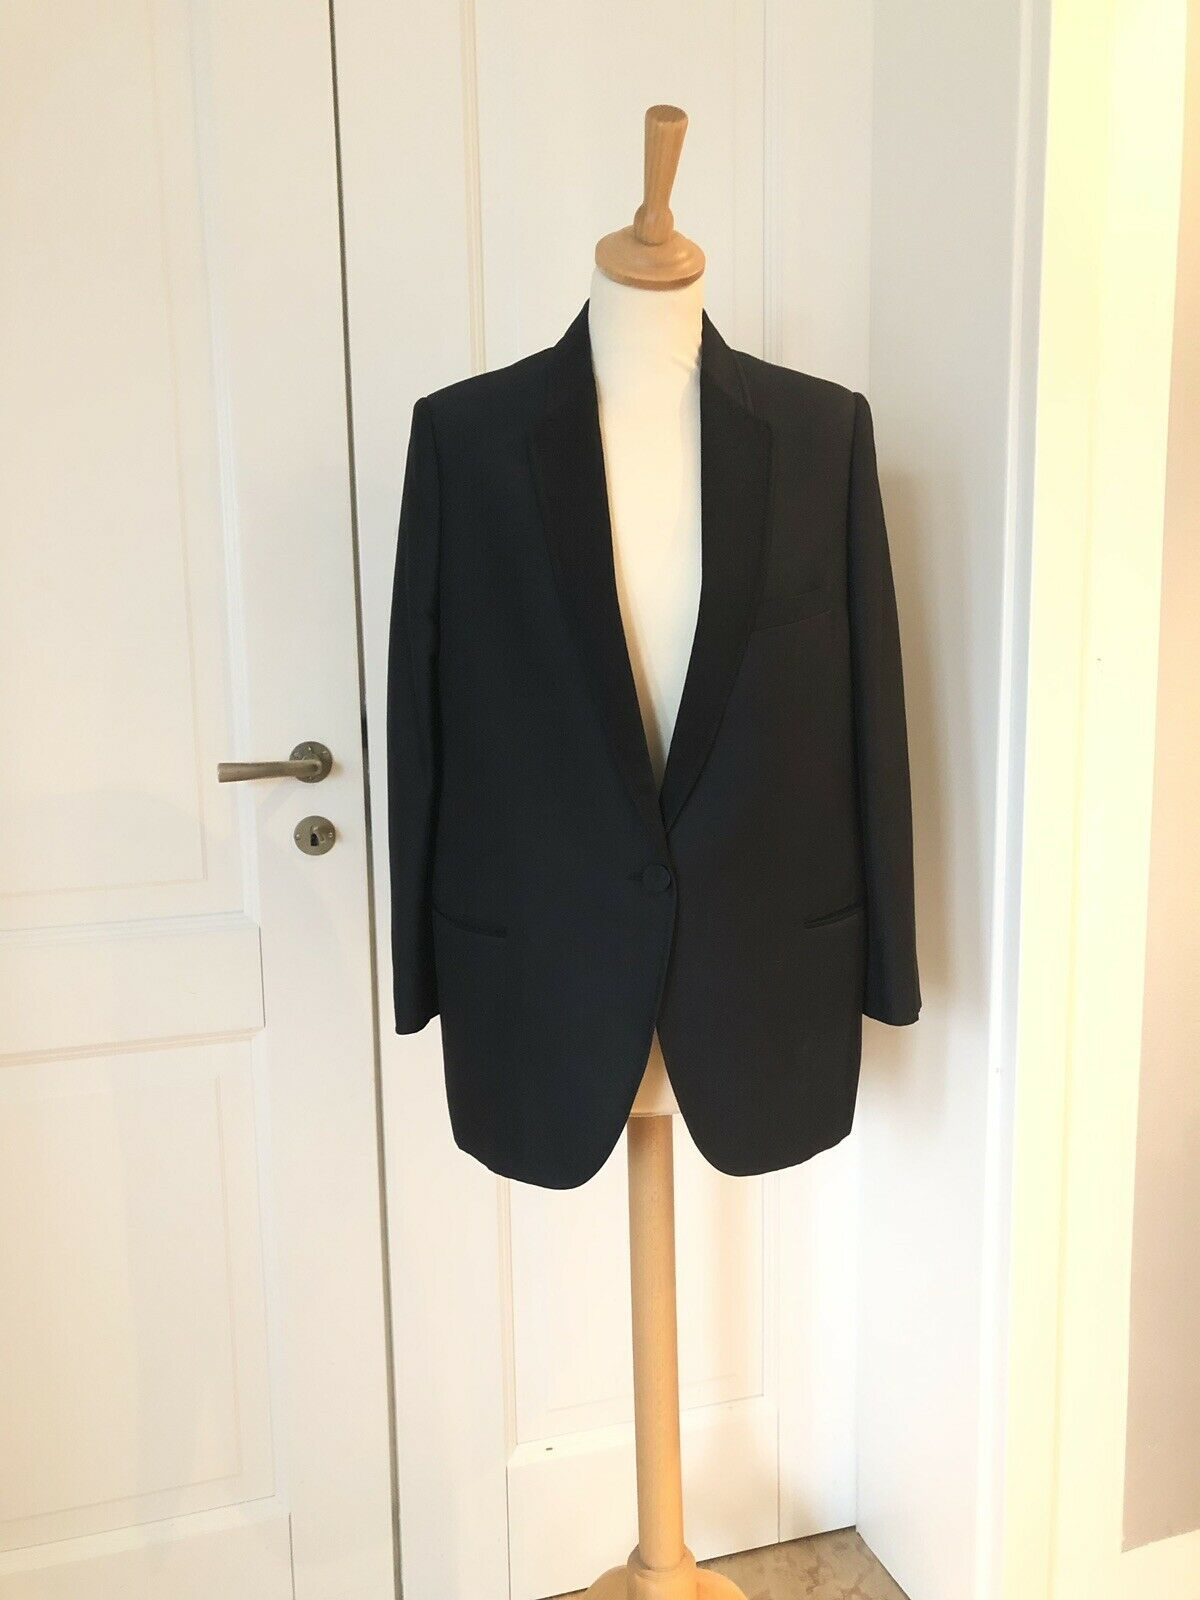 Stella McCochetney  BLAZER chaqueta seda Silk  connotación de lujo discreta